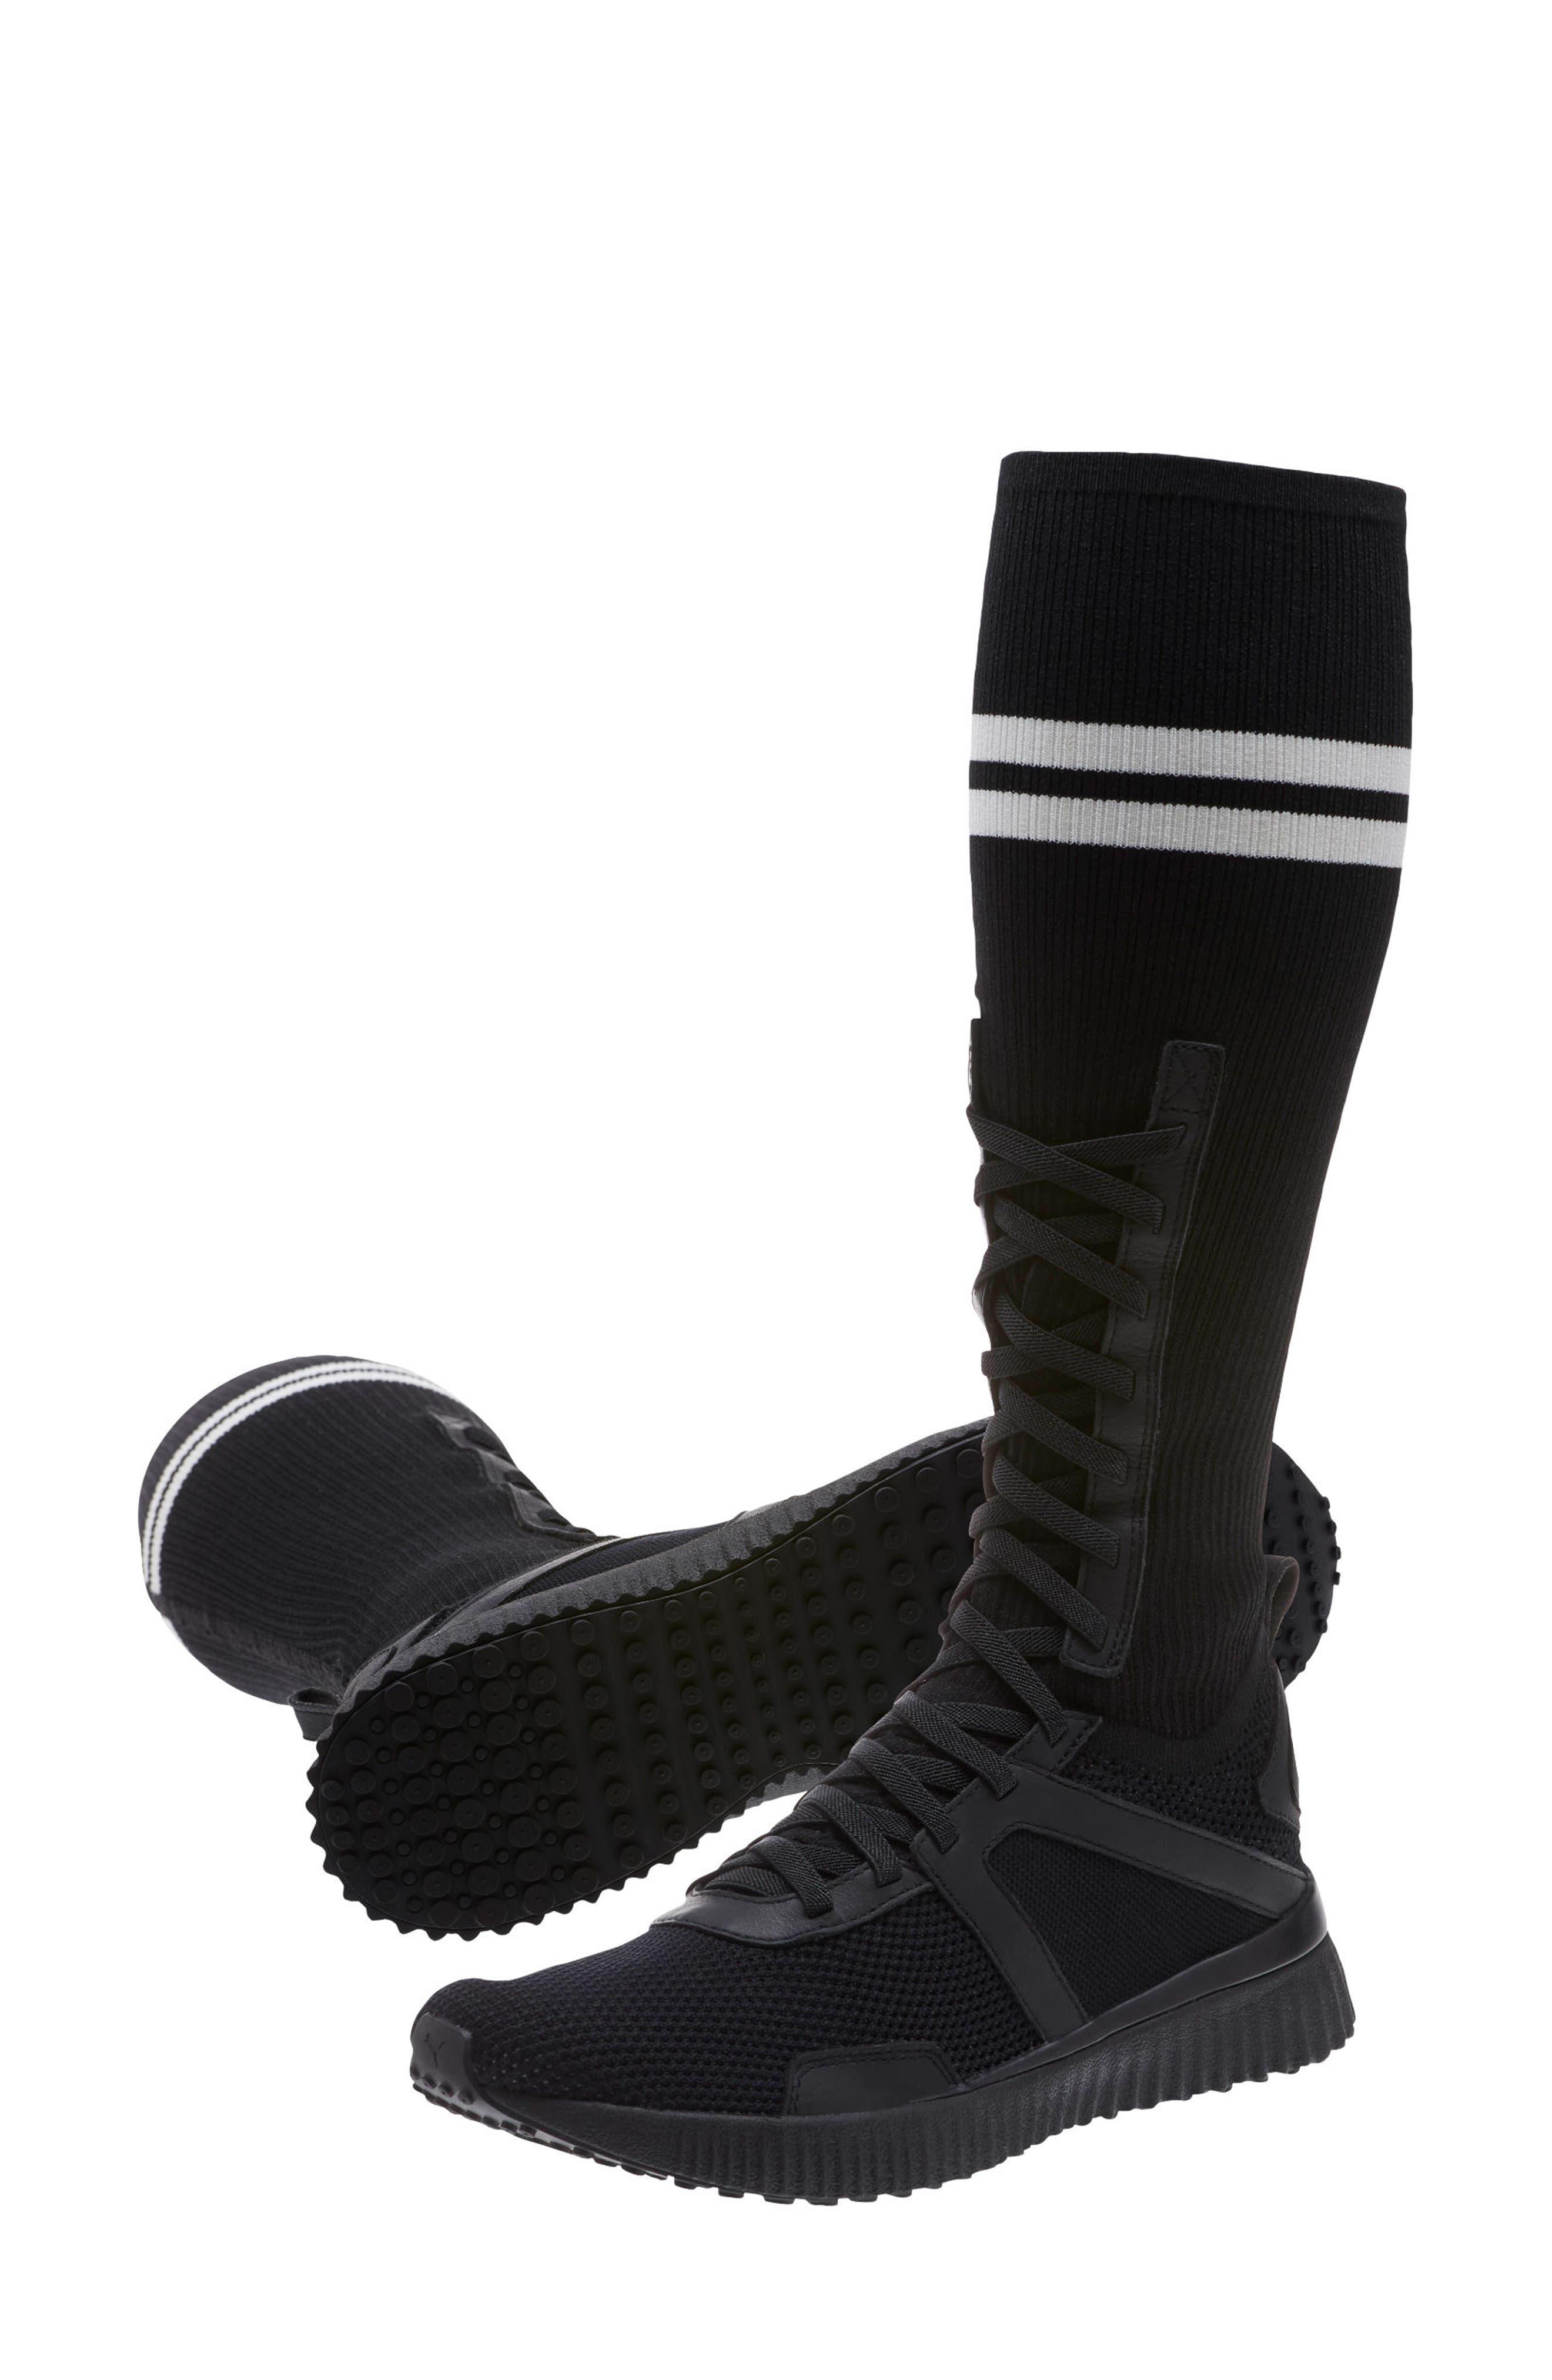 Alternate Image 1 Selected - FENTY PUMA by Rihanna Sneaker Boot (Women)